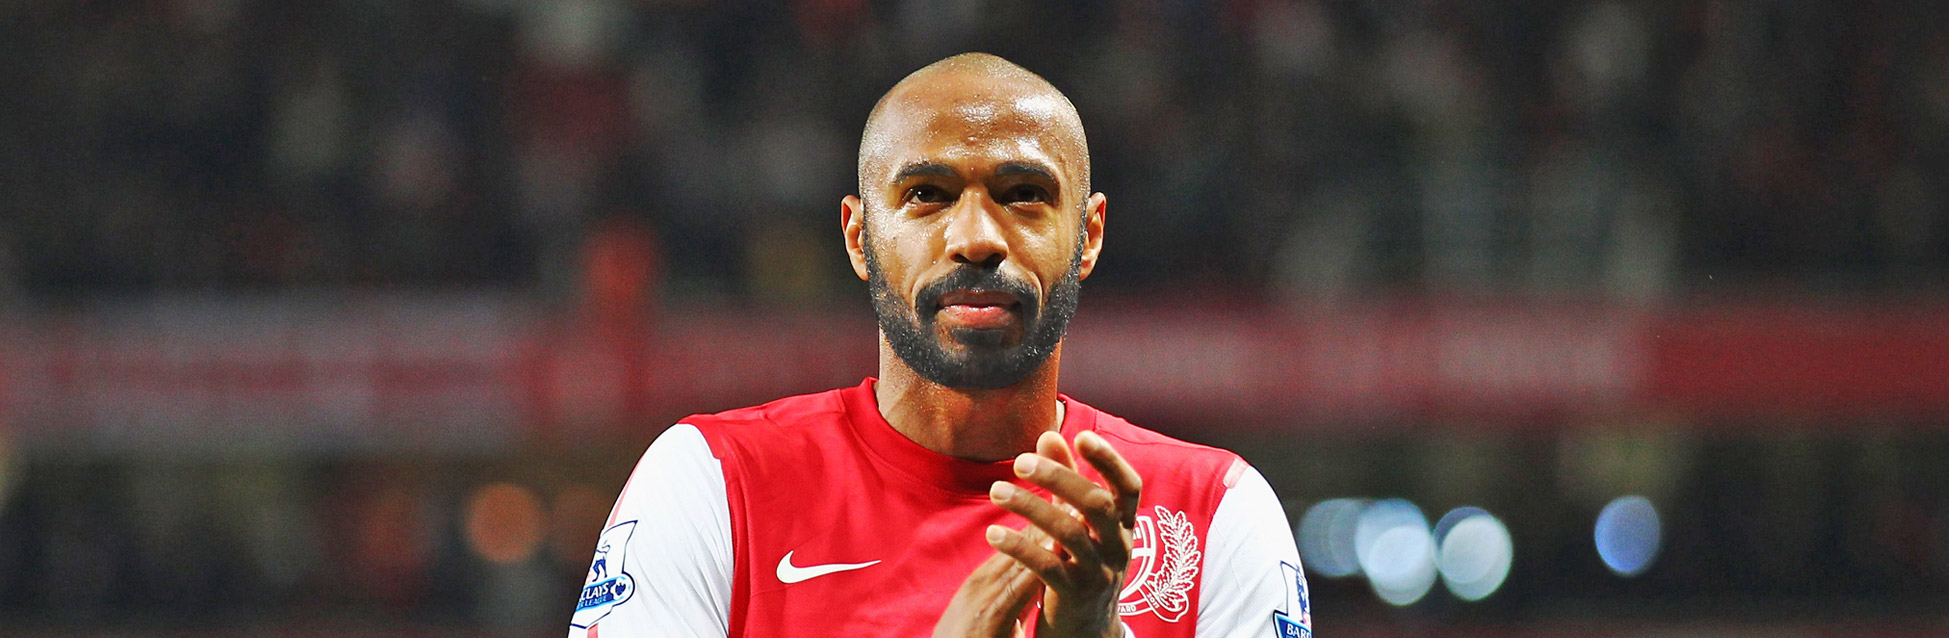 Henry veterano en el Arsenal